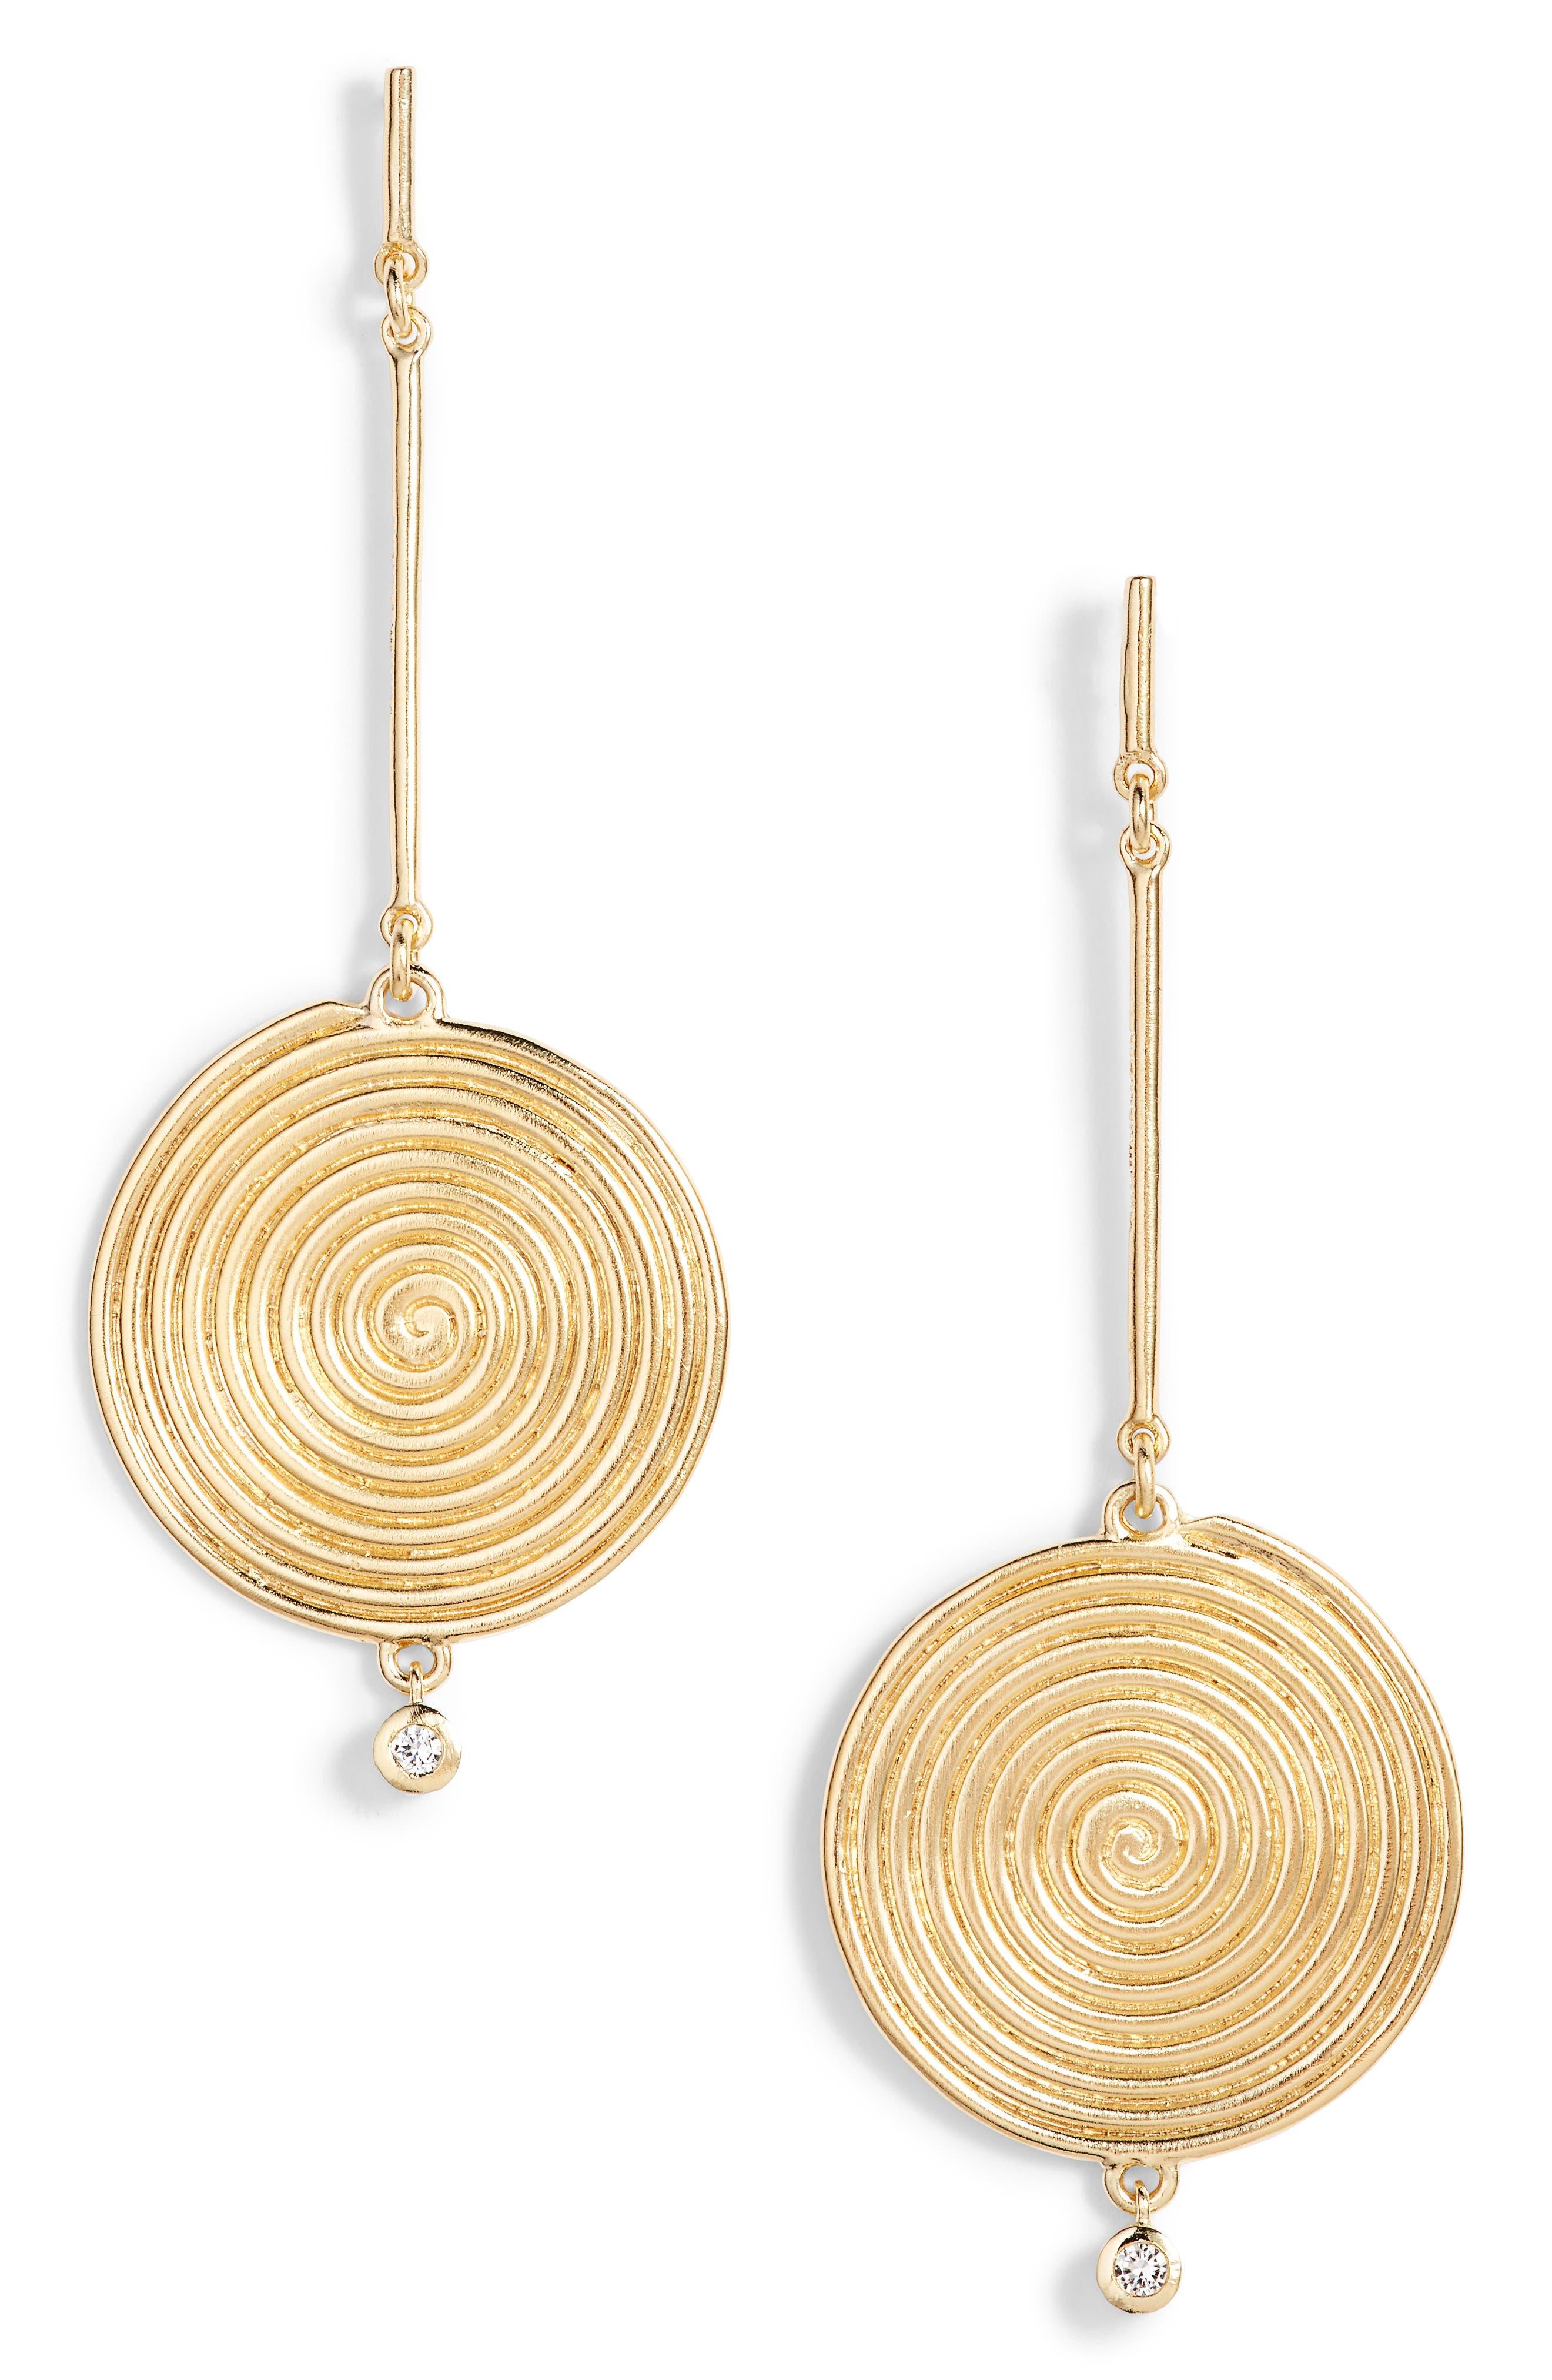 Sullivan - Lainey White Topaz Drop Earrings,                             Main thumbnail 1, color,                             715